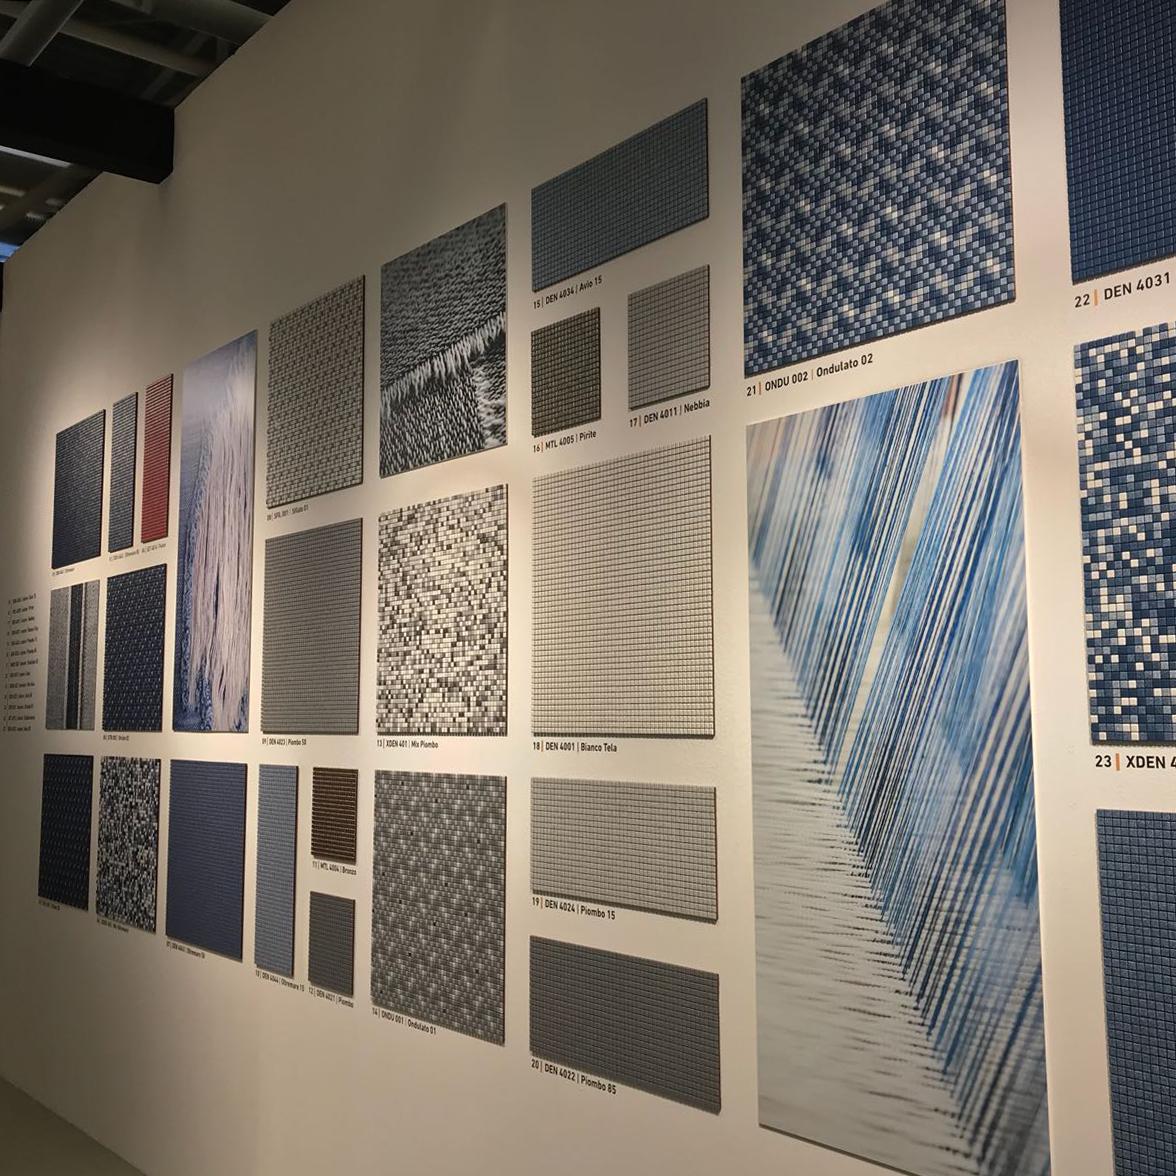 Appiani-Denim-Addessi-Design-cersaie-2018 (3)